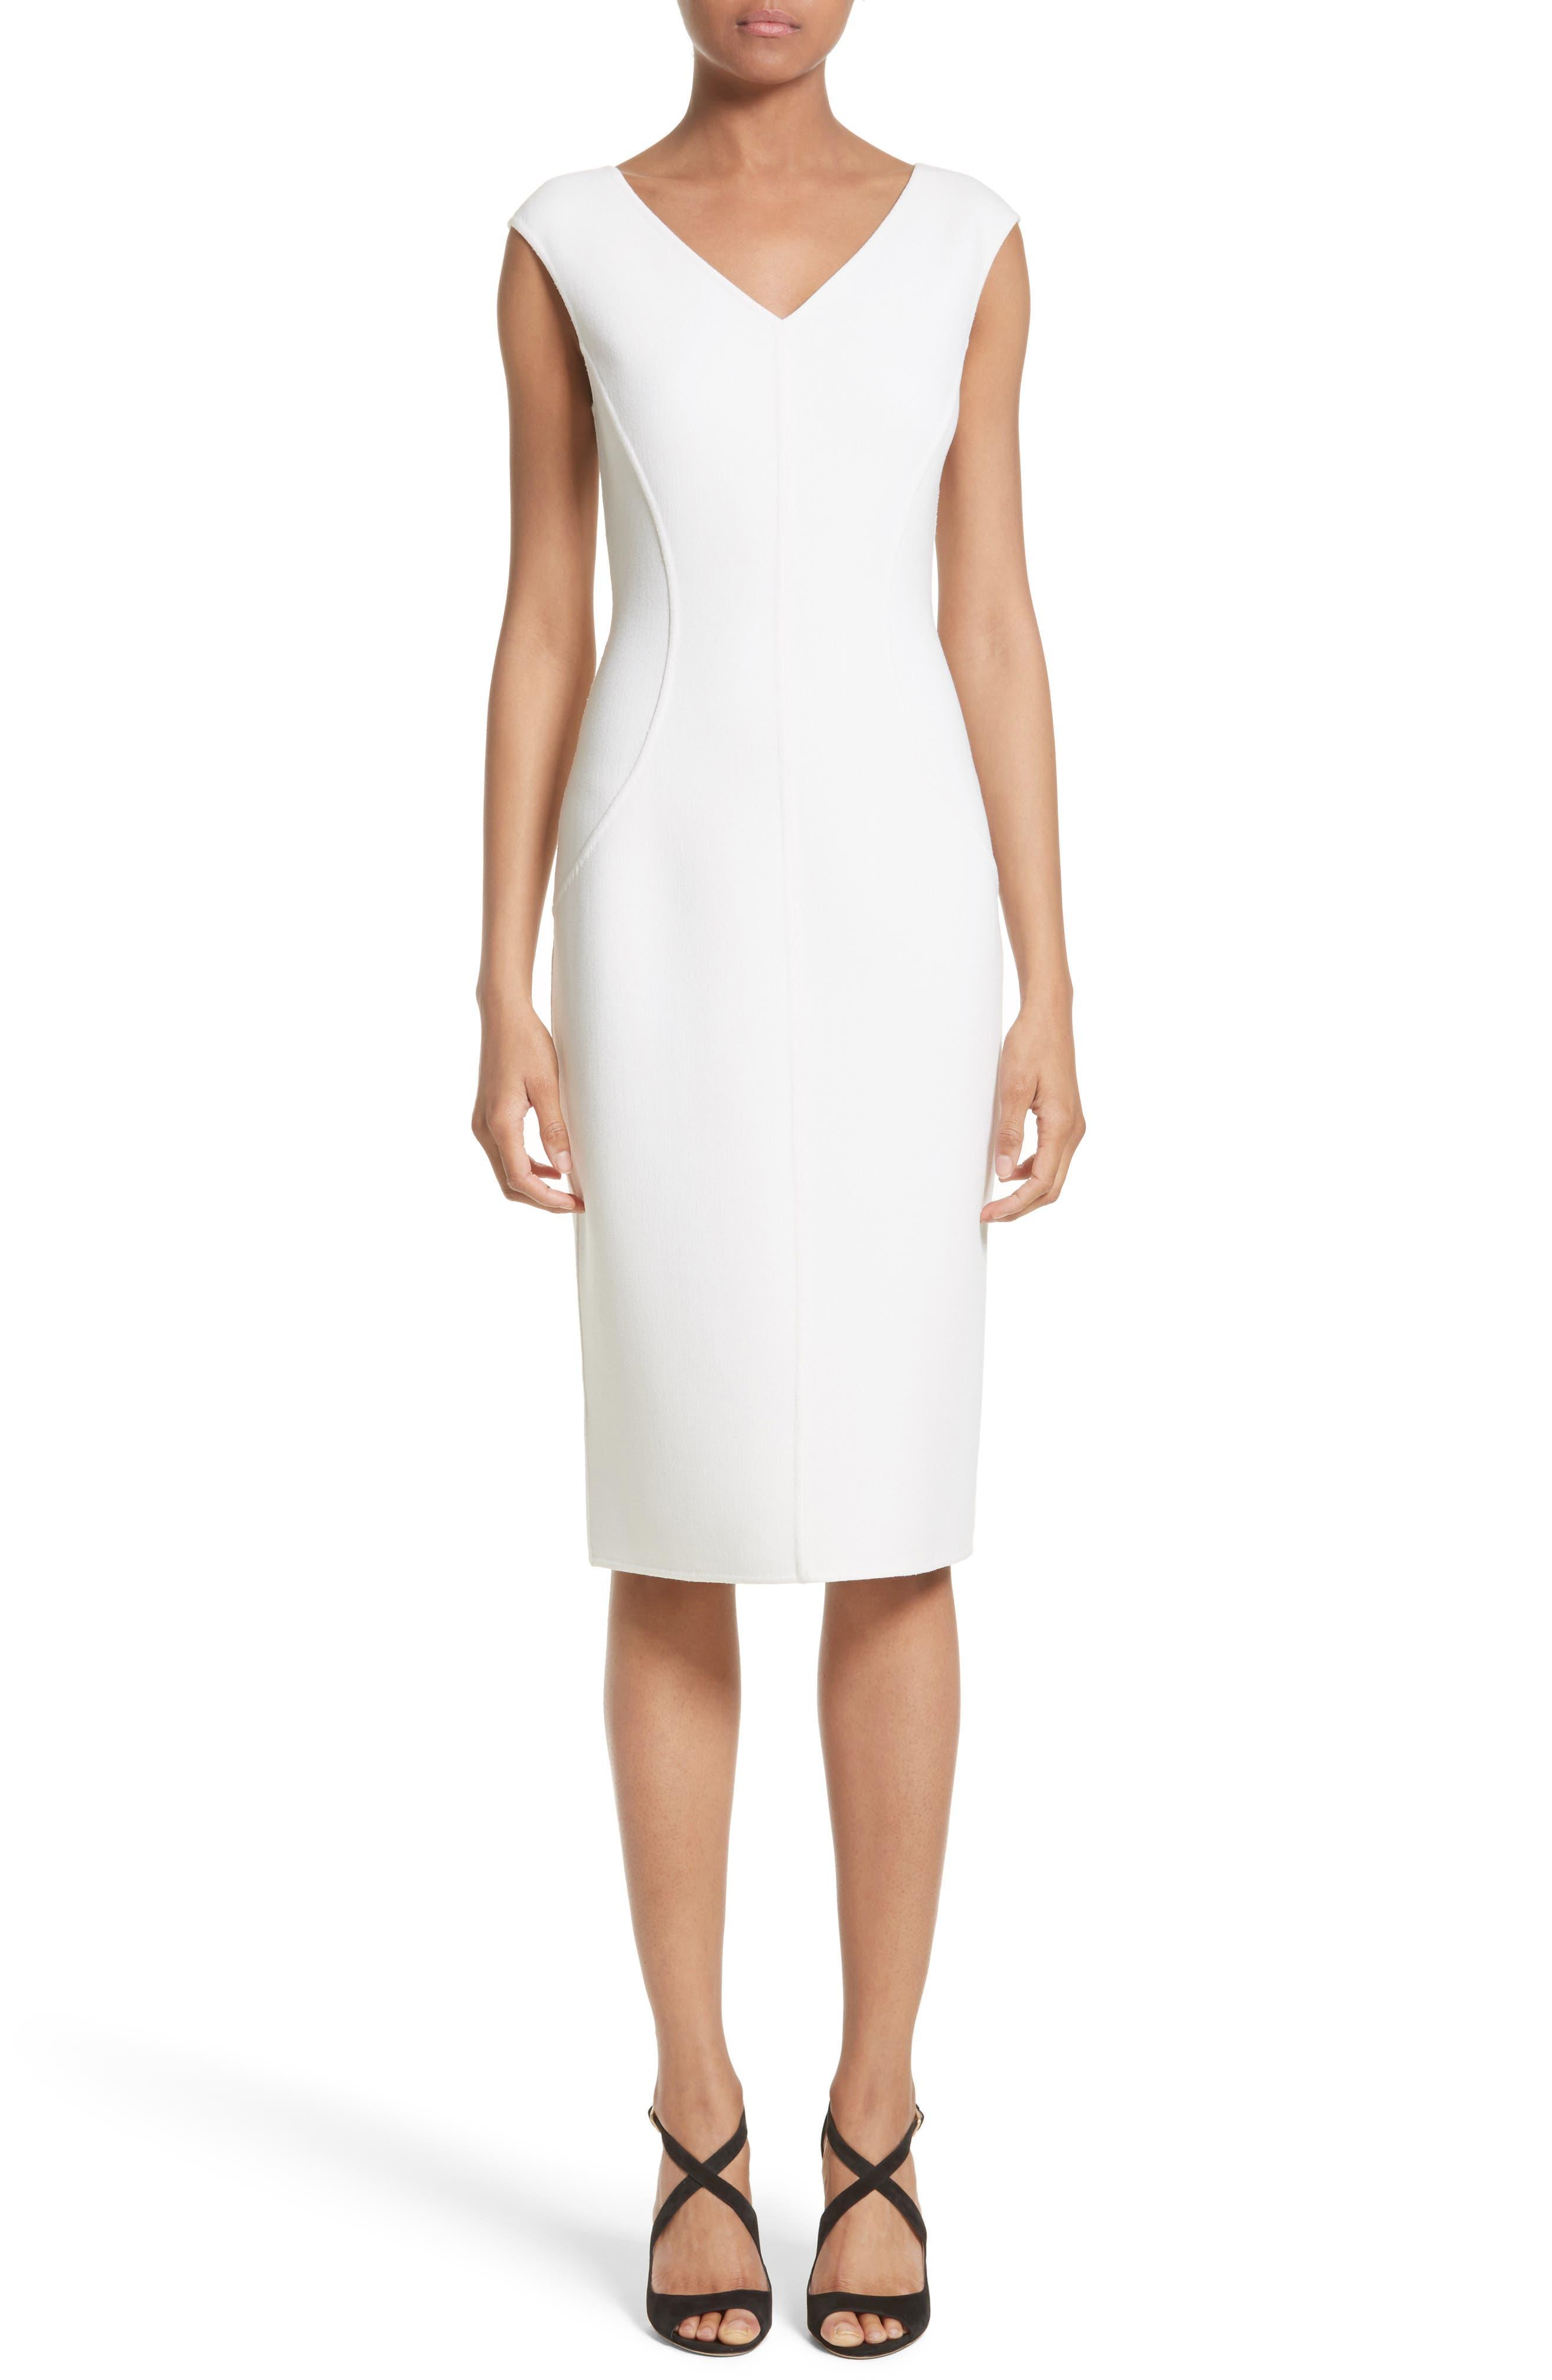 Alternate Image 1 Selected - Michael Kors Stretch Bouclé Sheath Dress